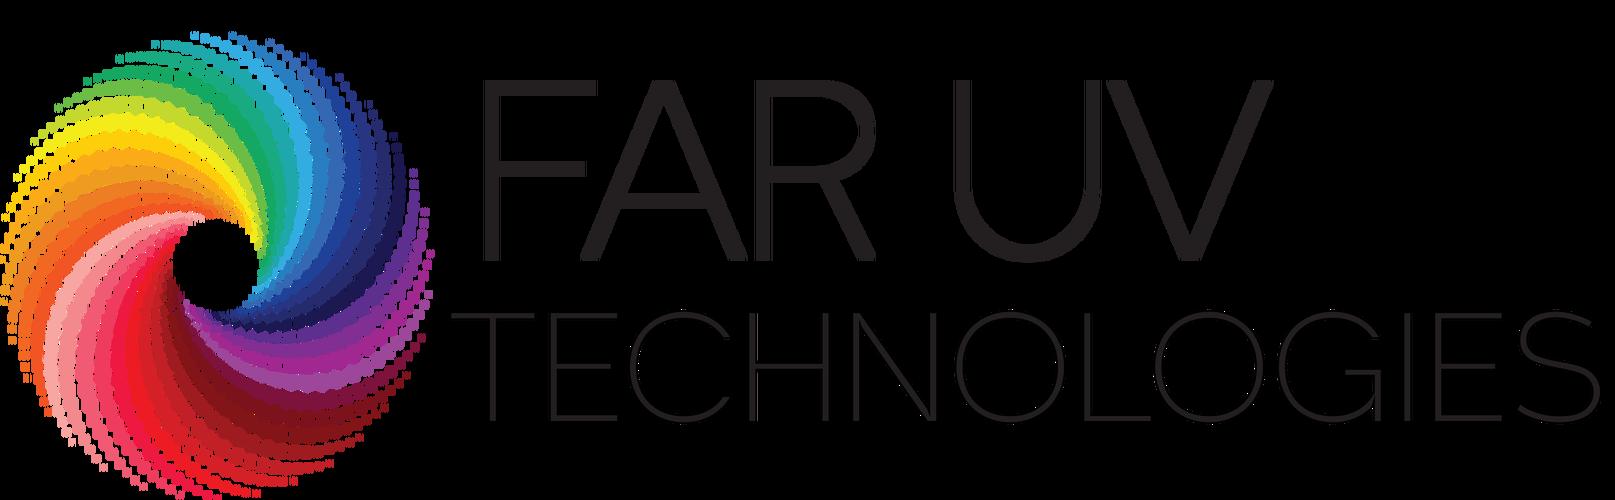 Far UV Technologies, Inc.